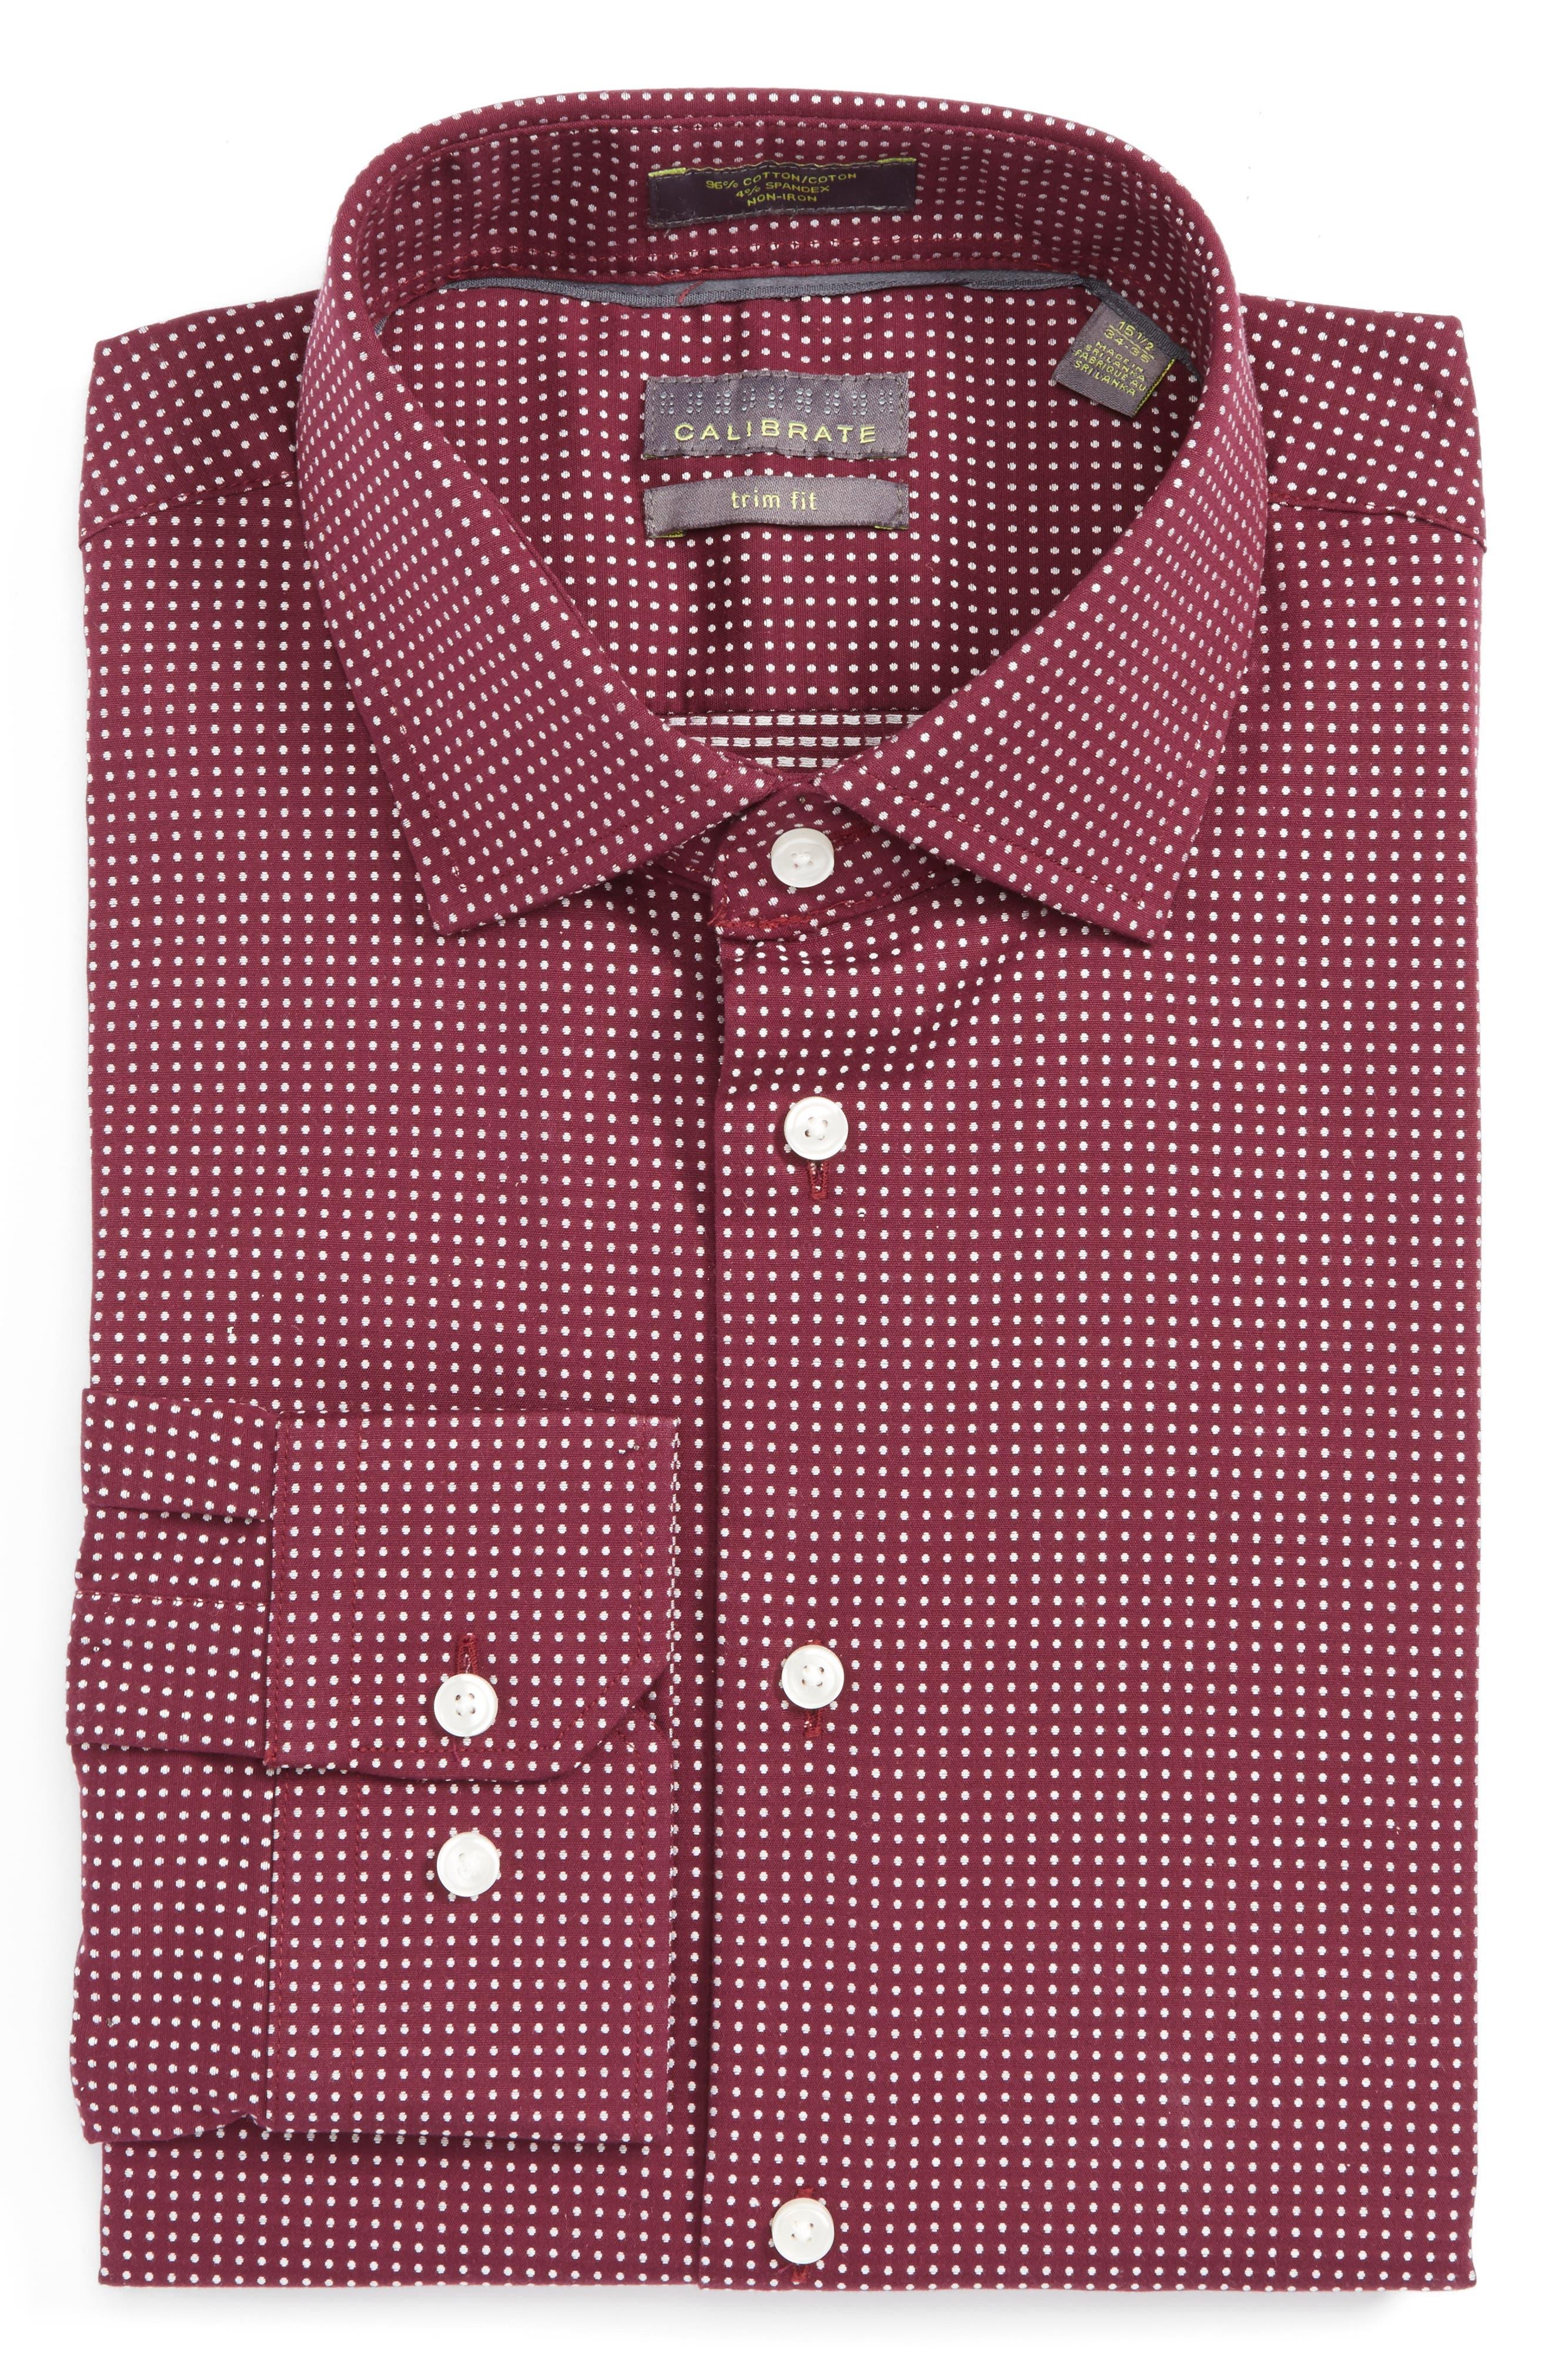 Alternate Image 1 Selected - Calibrate Trim Fit Non-Iron Dot Stretch Dress Shirt